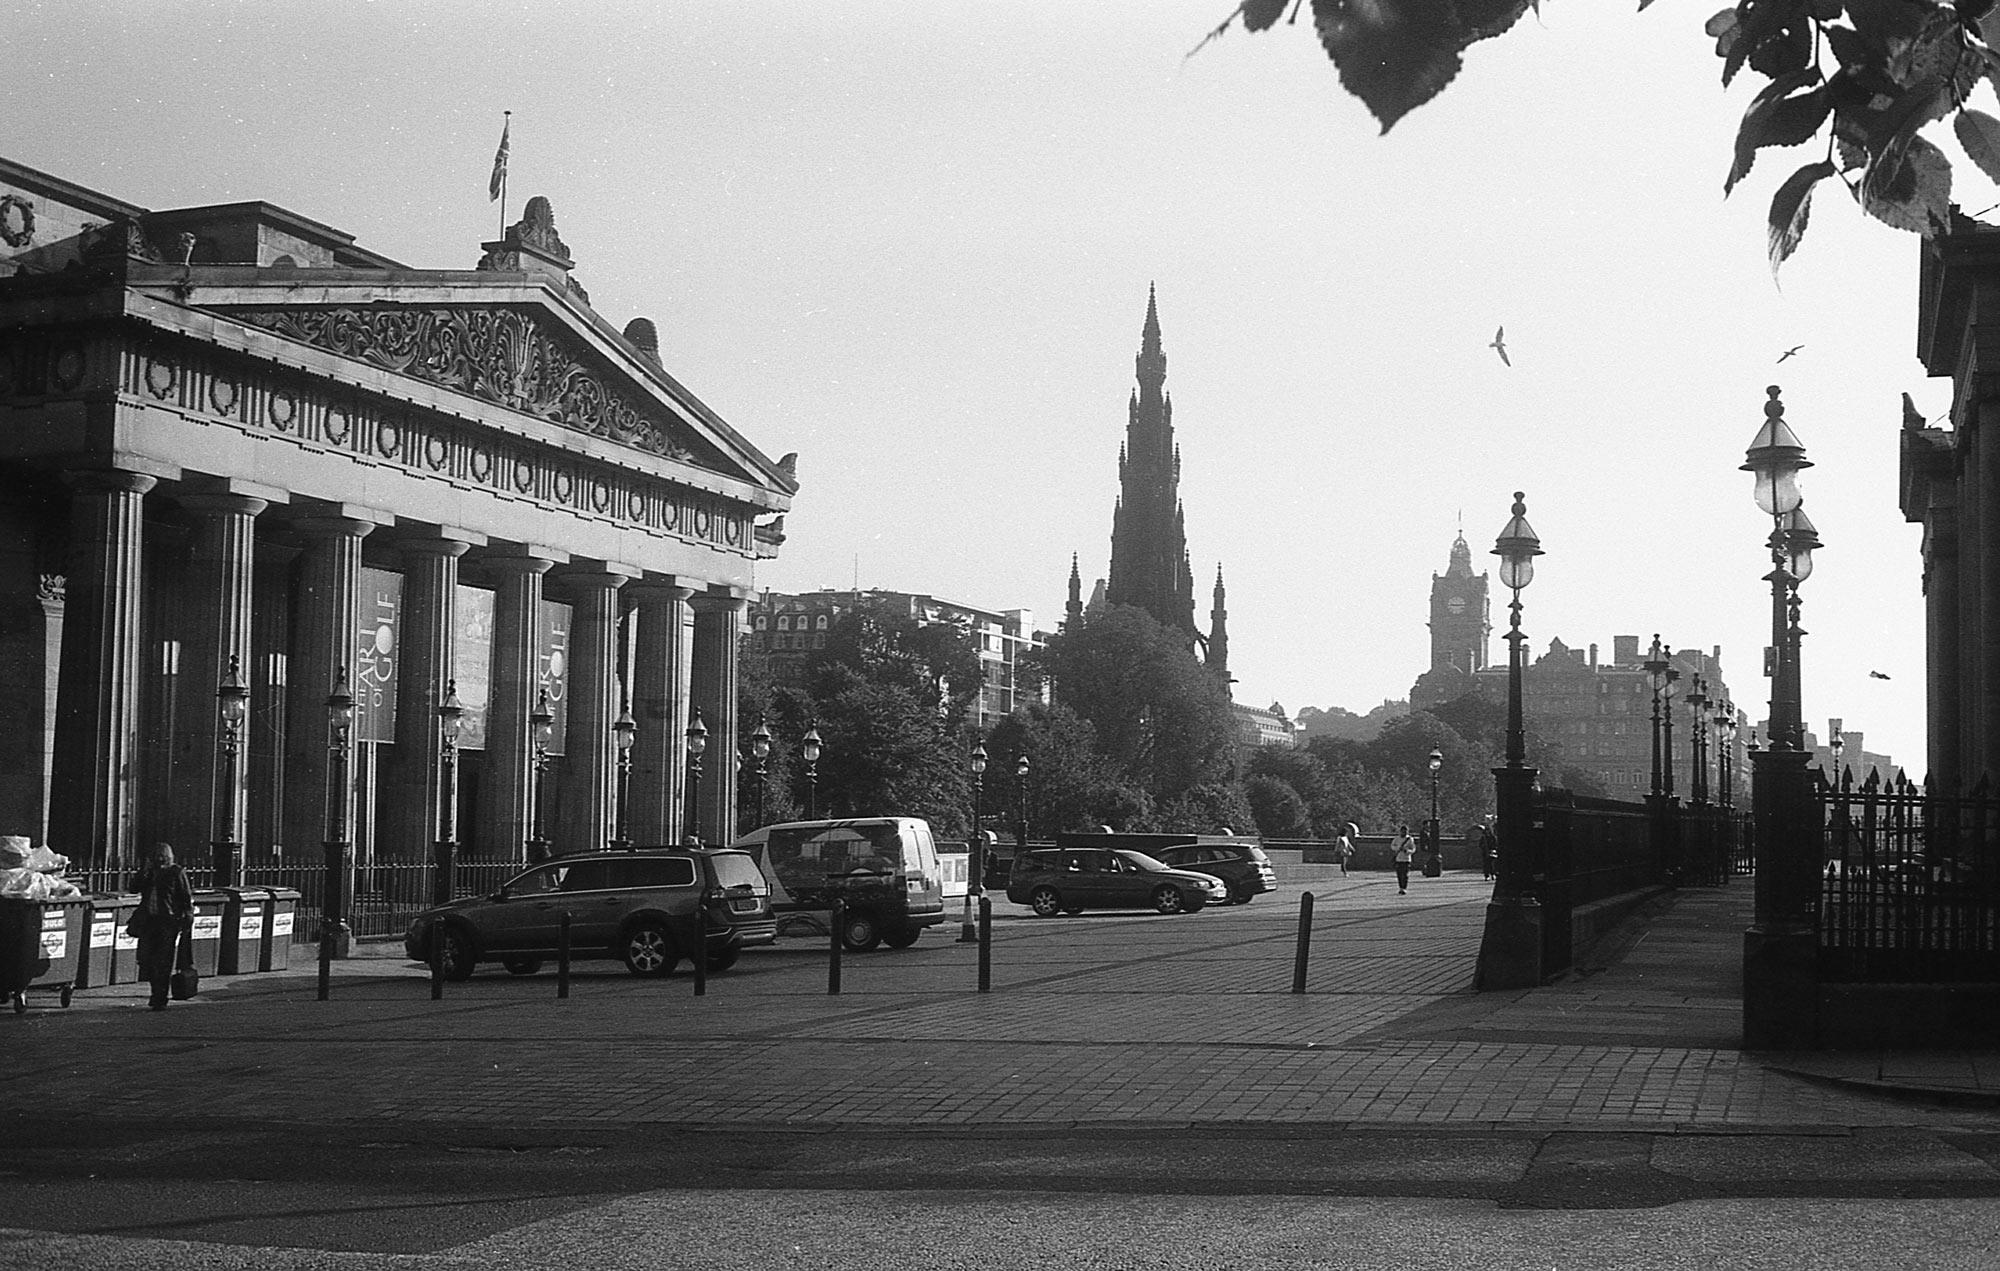 # 1 Edinburgh / Stirling – Scotland